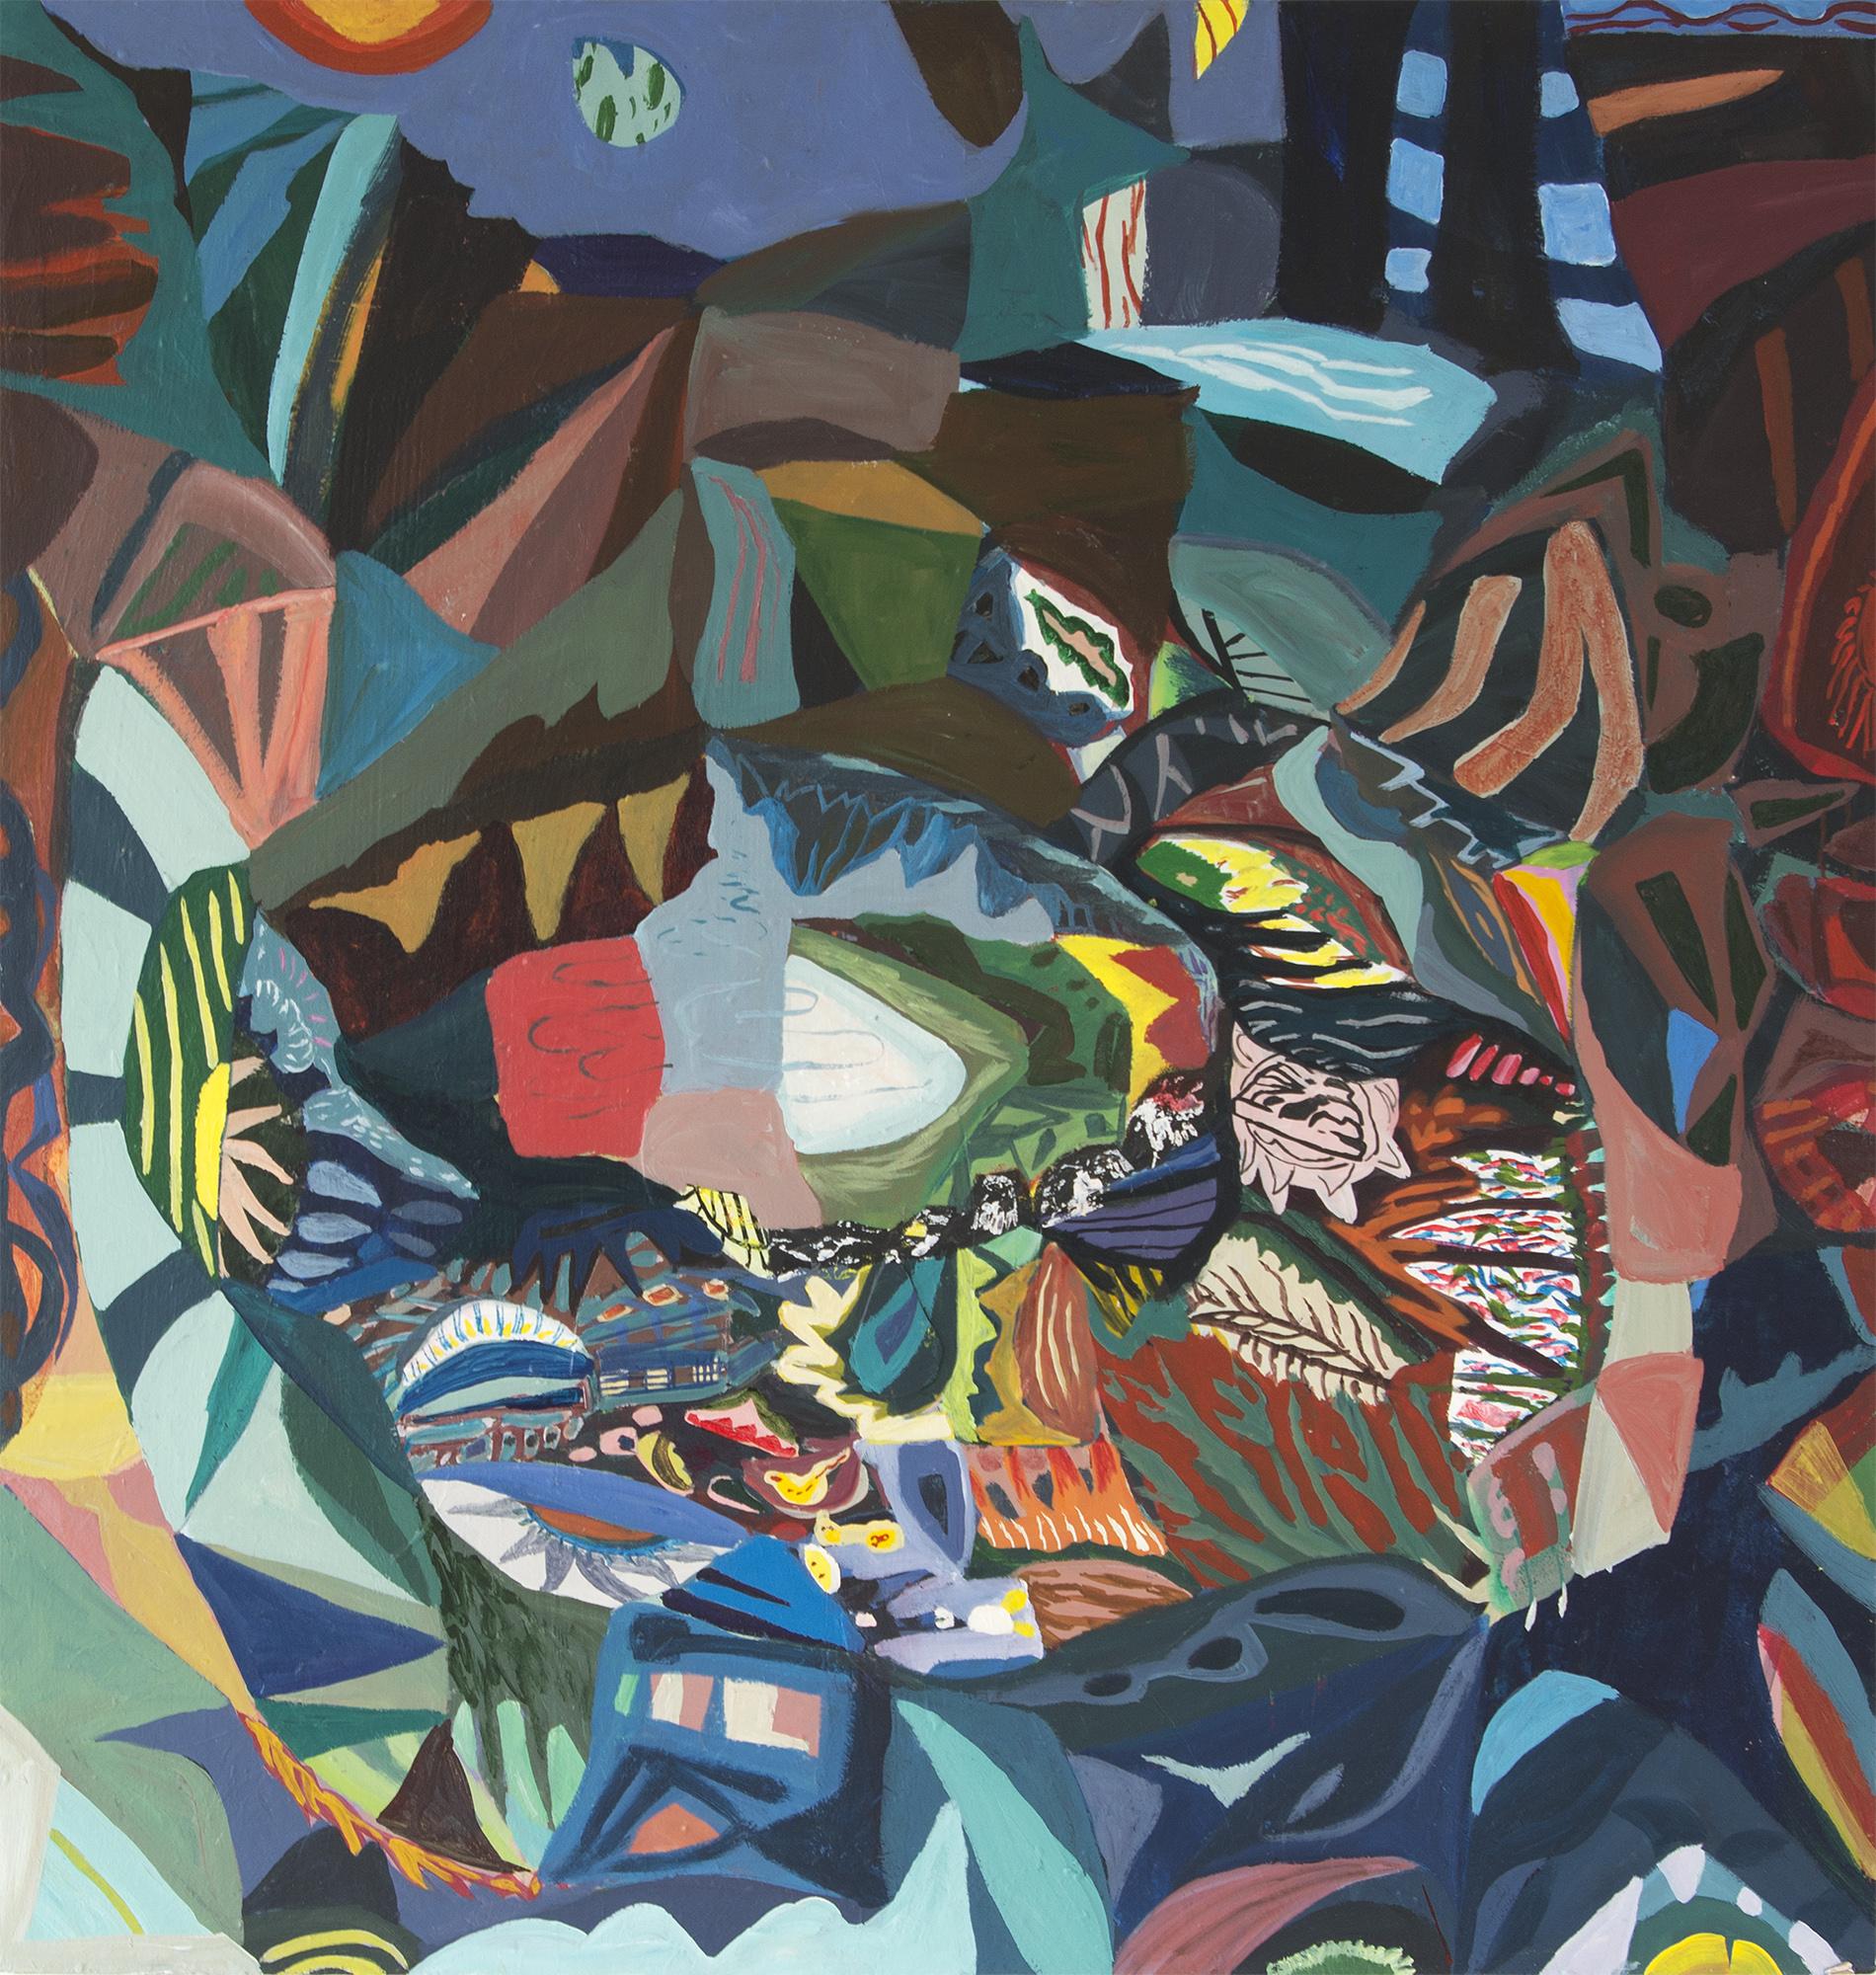 Marie Dahlstrand, Underground, 2016, acrylic, oil on mdf, 105 x 100 cm (41.3 x 39.4 inches).